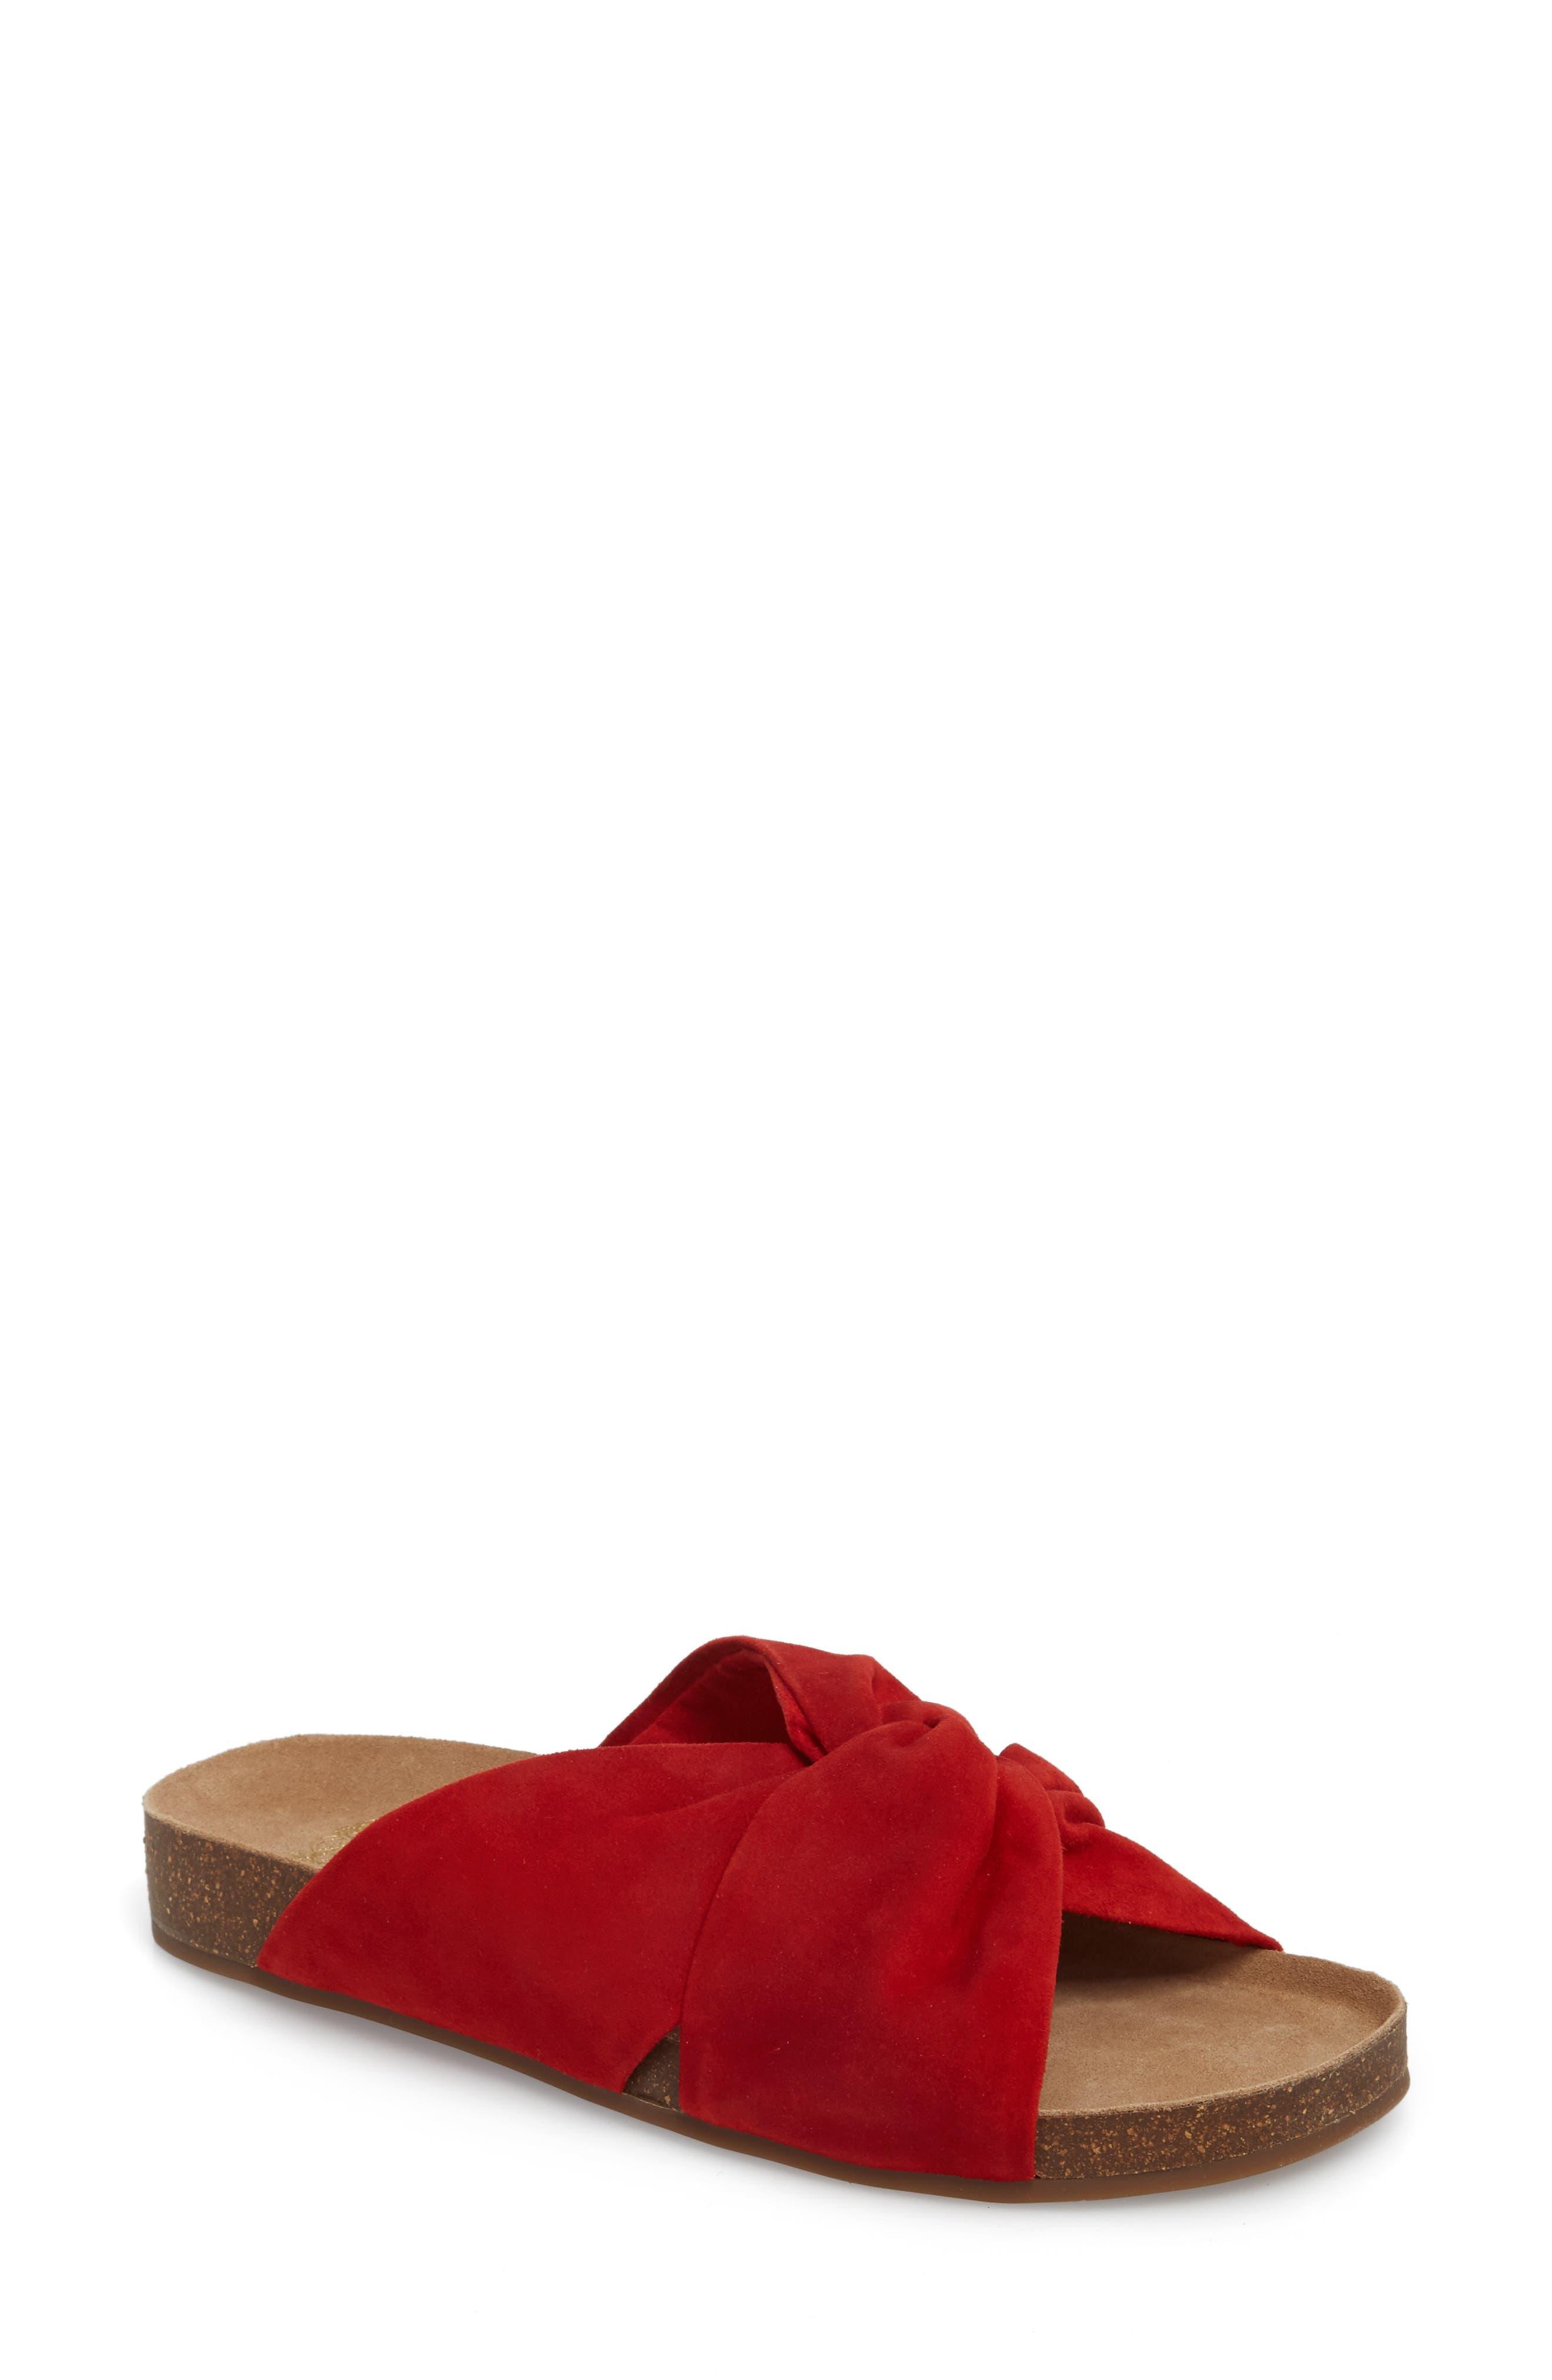 Biminti Slide Sandal,                         Main,                         color, Red Hot Rio